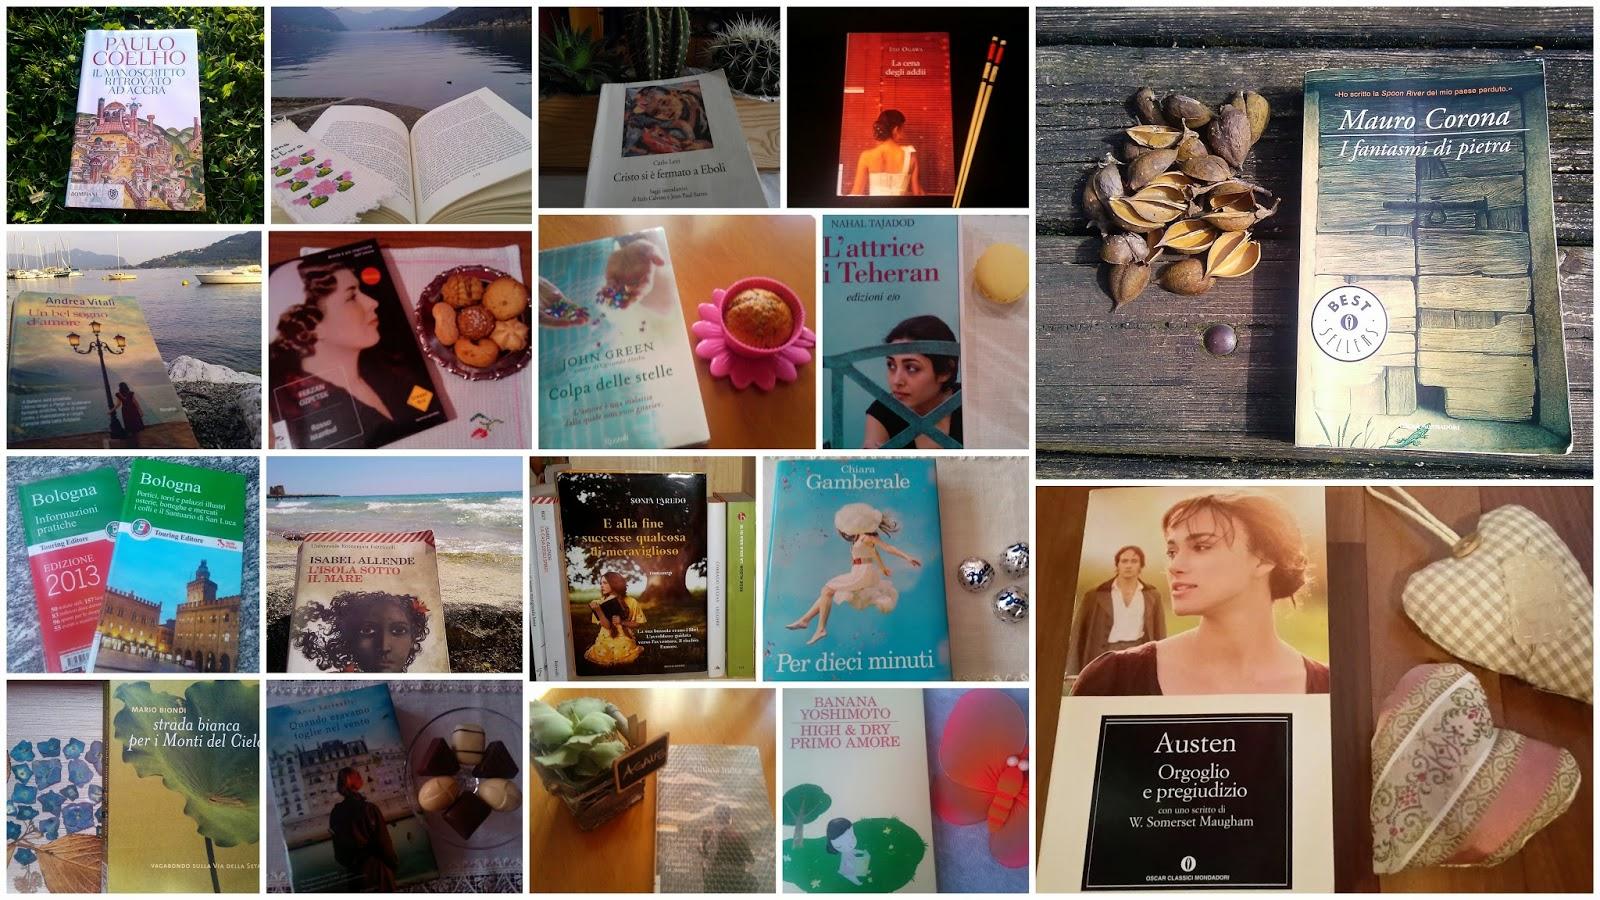 raccolta libri letture top del 2014